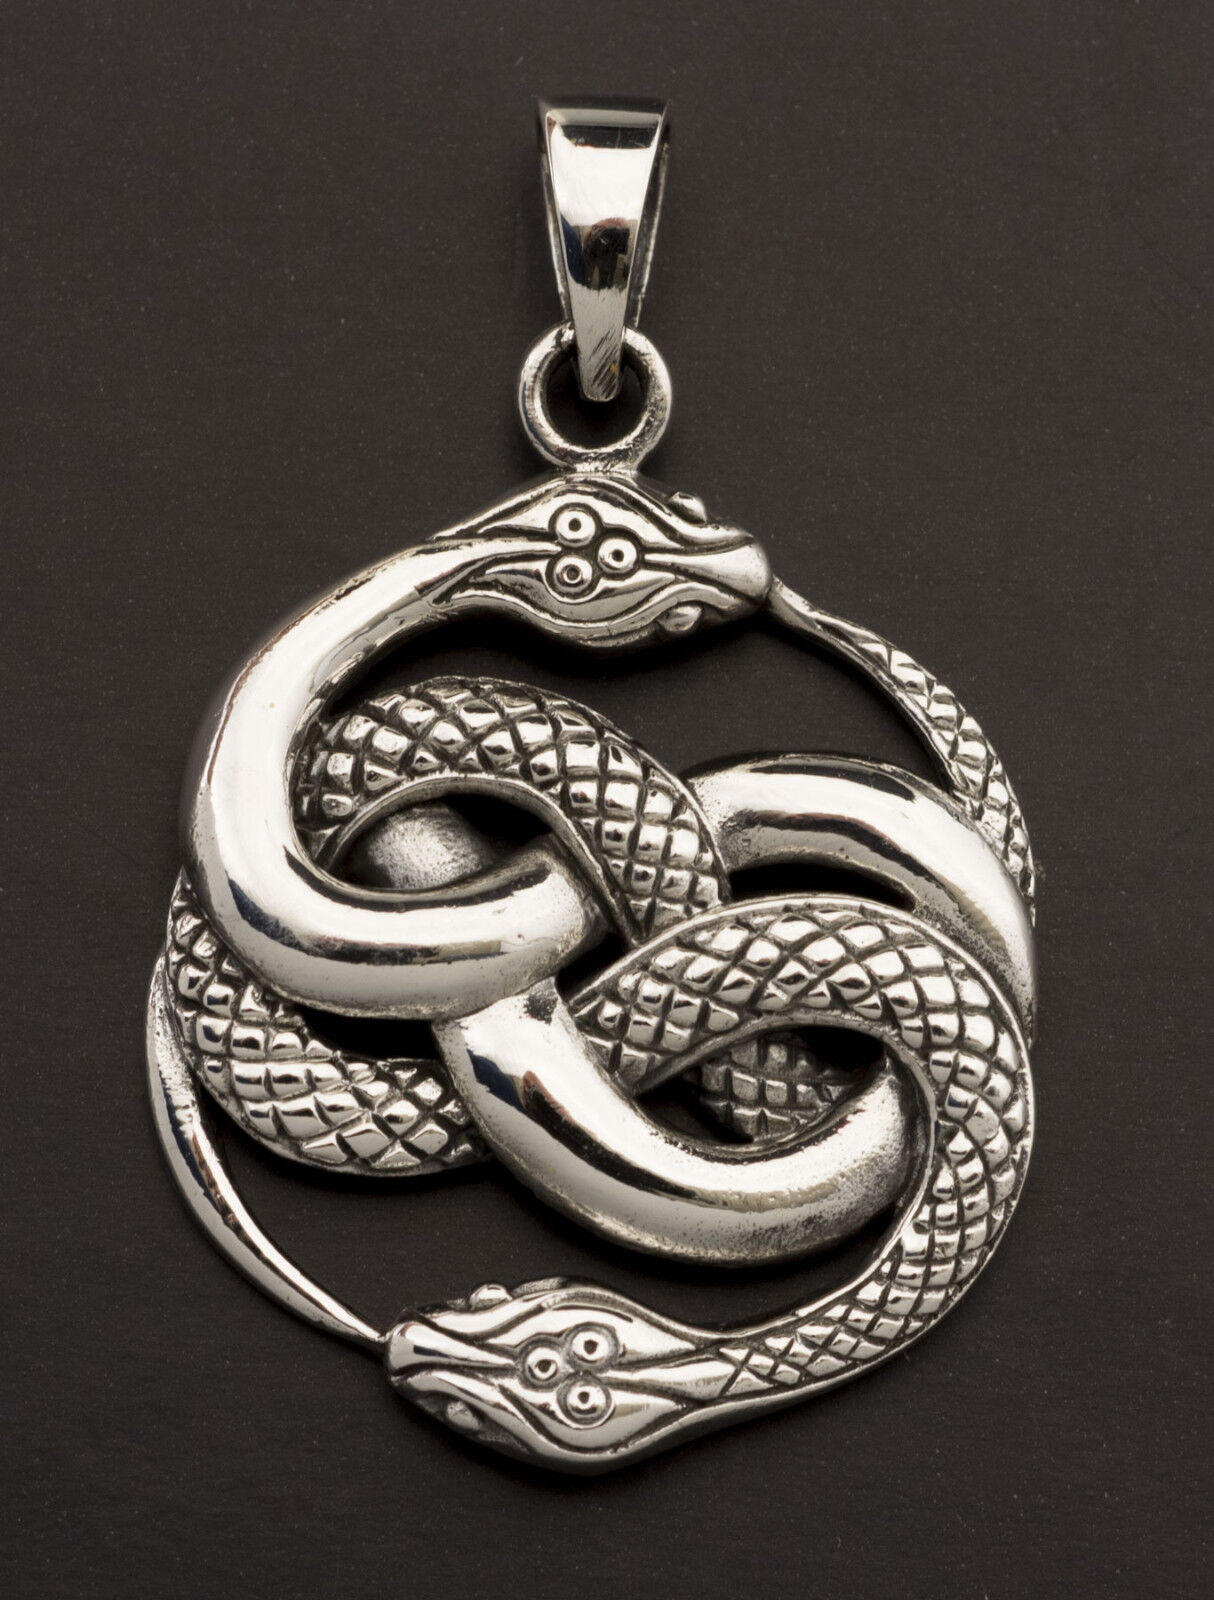 Pendentif tibetain Serpent ourobgolds en silver 925 massif 8.1g Tibet 25898 M31